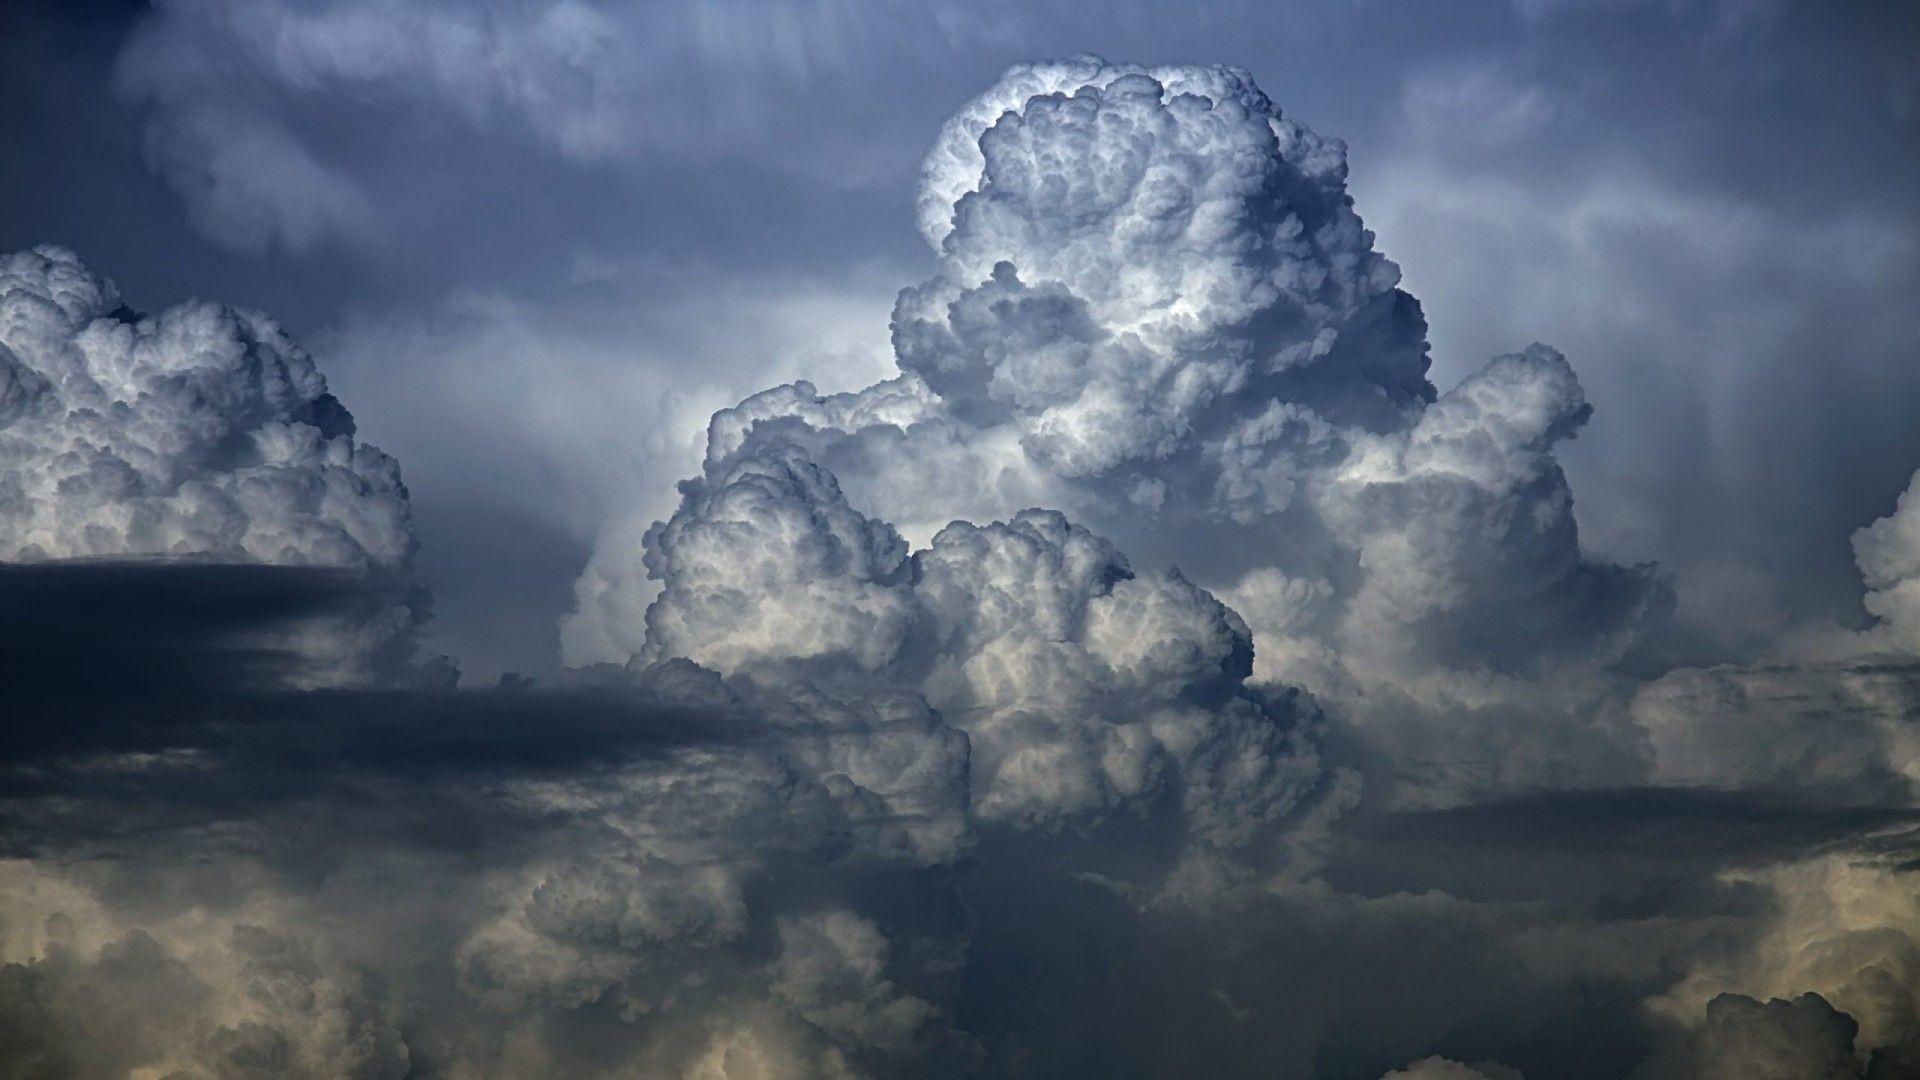 Res: 1920x1080, Amazing big dark cloud image